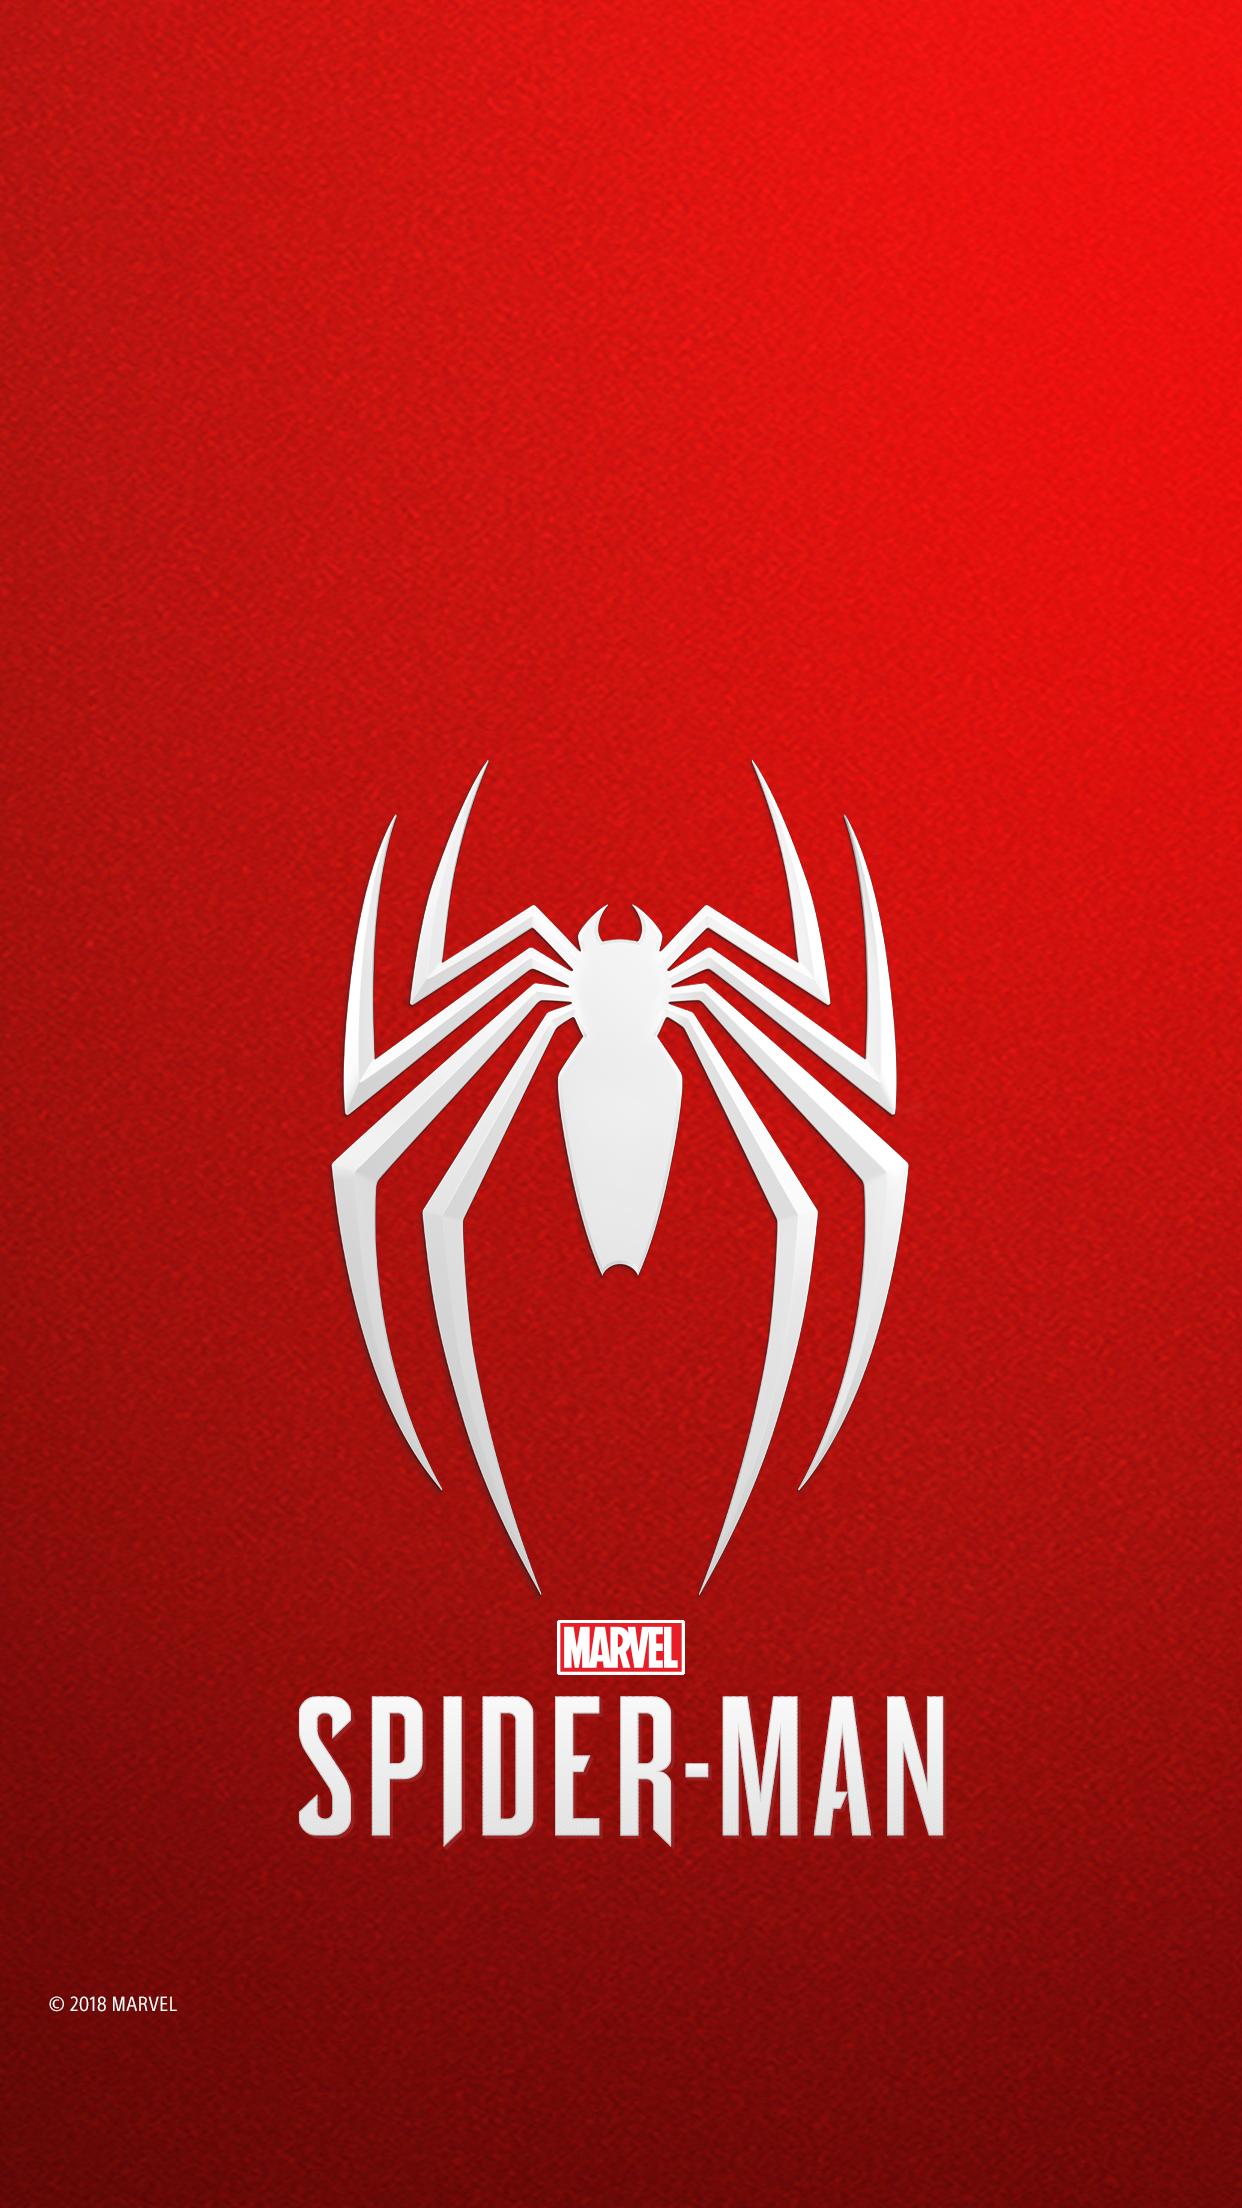 Que Linda Logo Marvel Spiderman Spiderman Ps4 Spider Man Ps4 Game